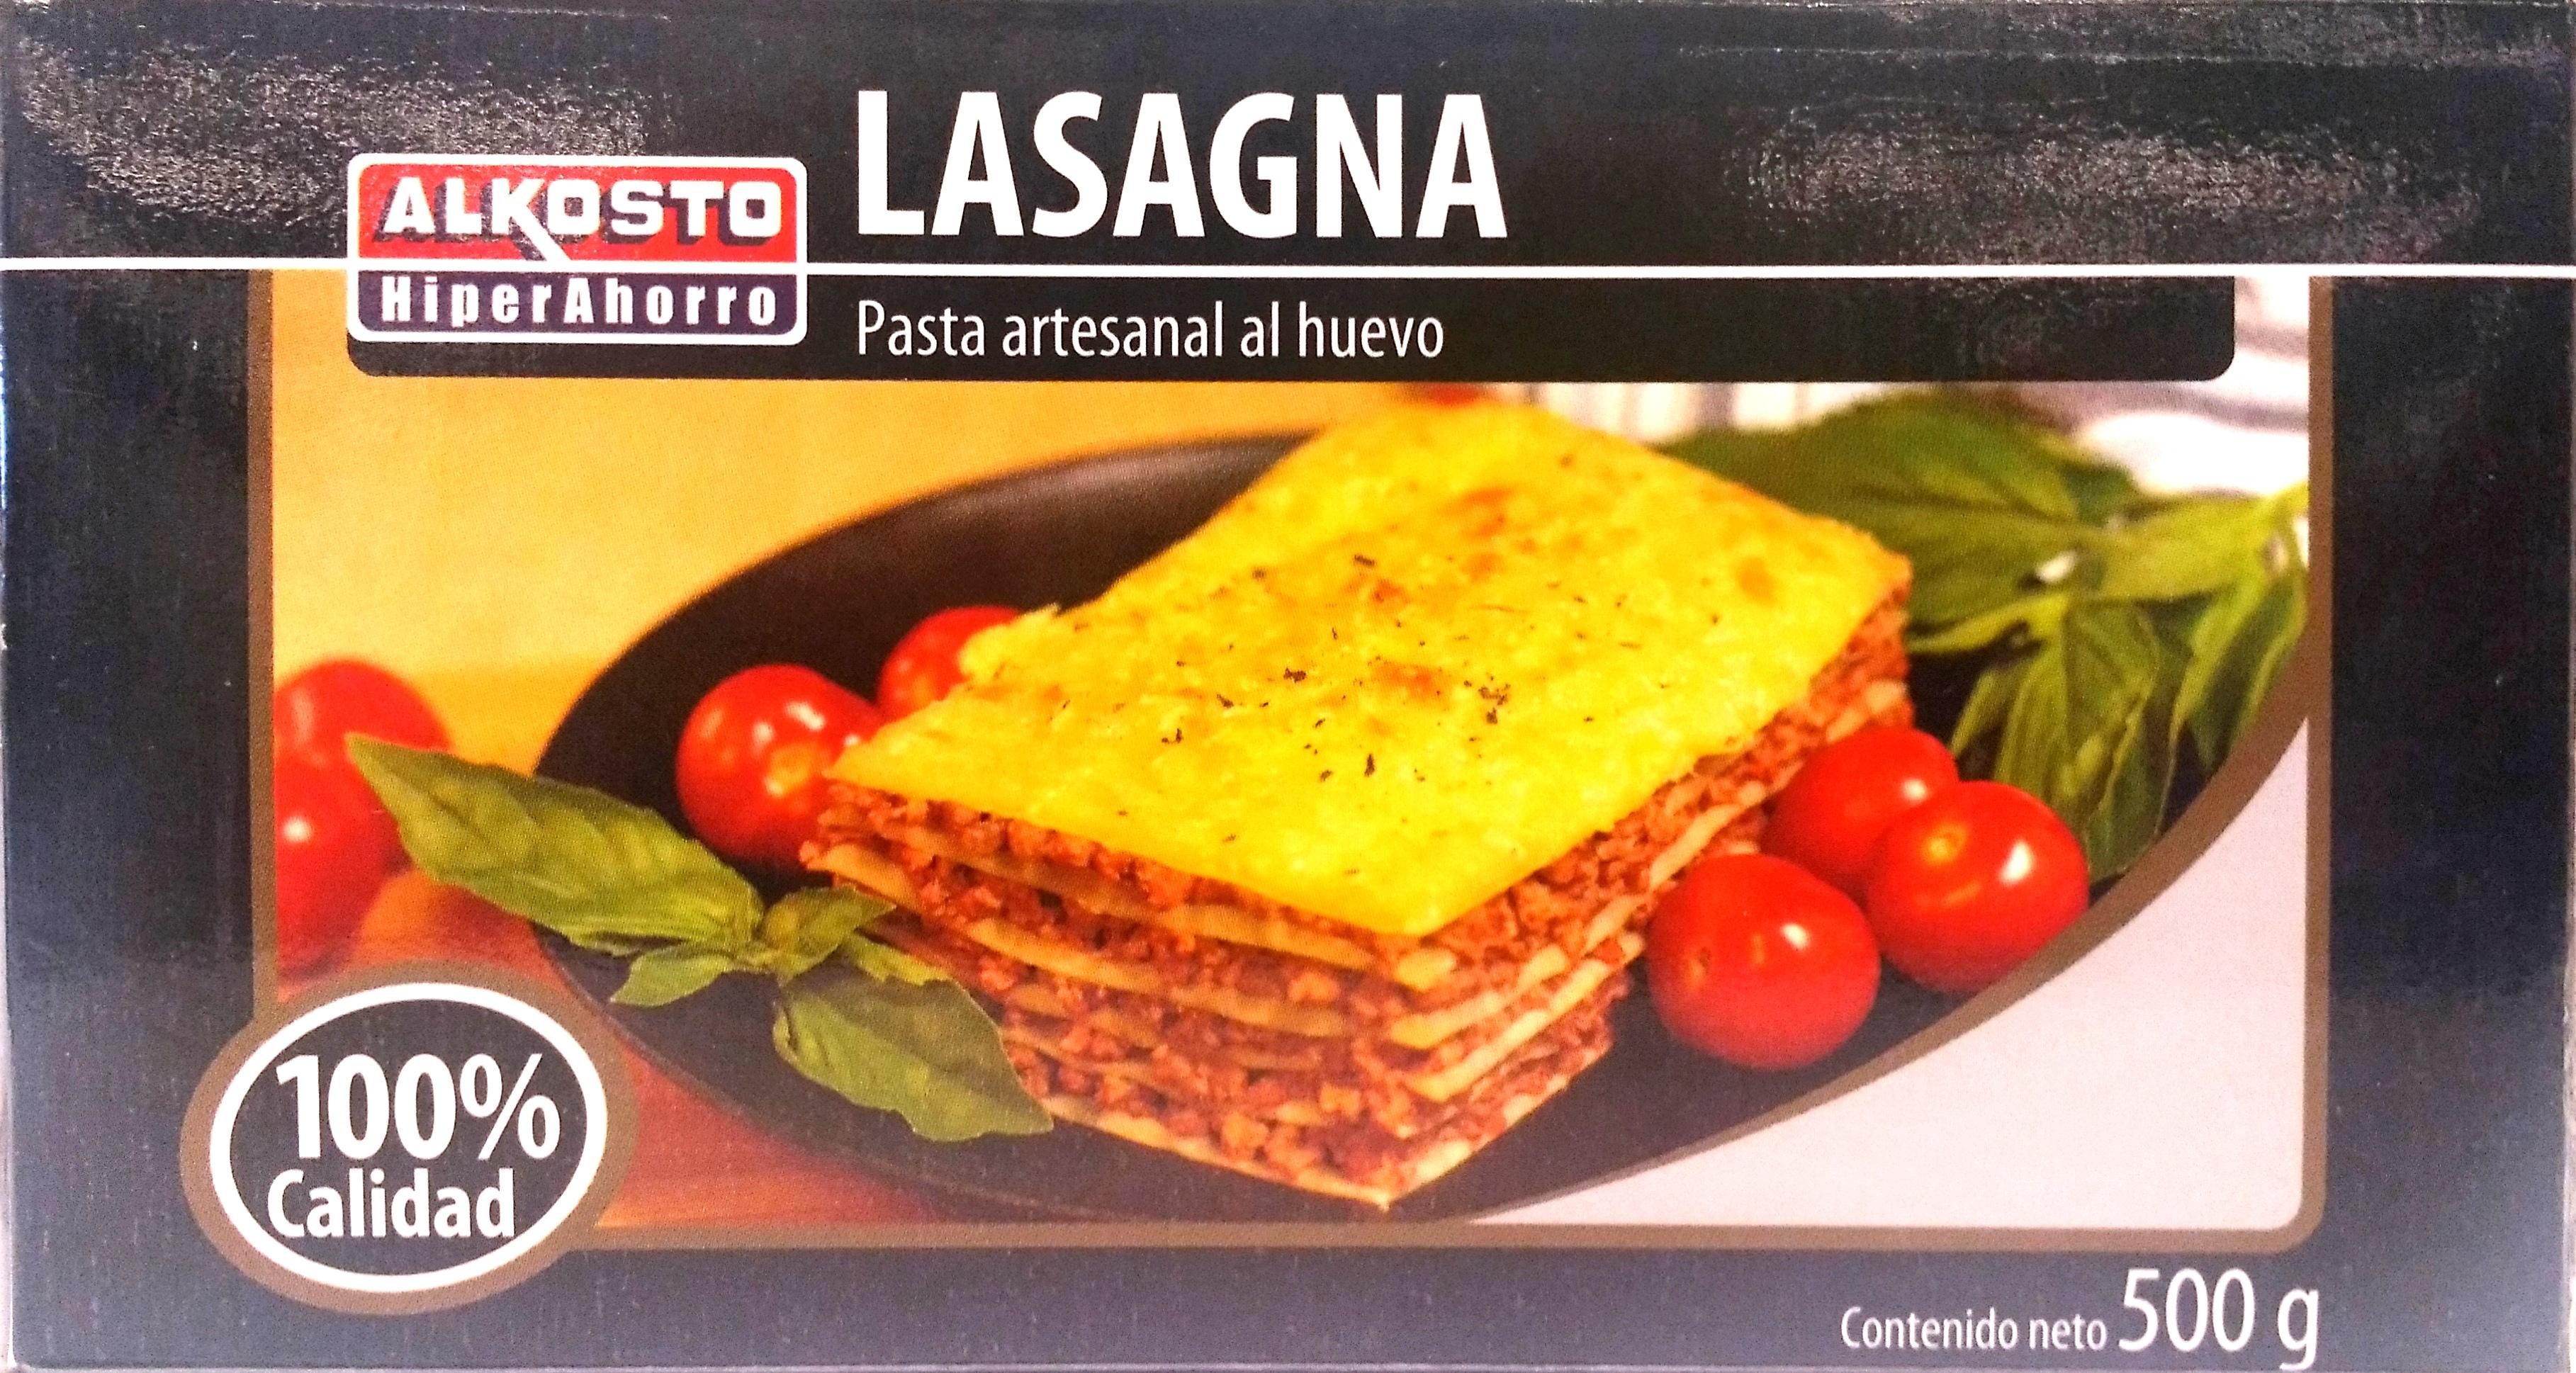 Lasagna Alkosto Artesanal 500g